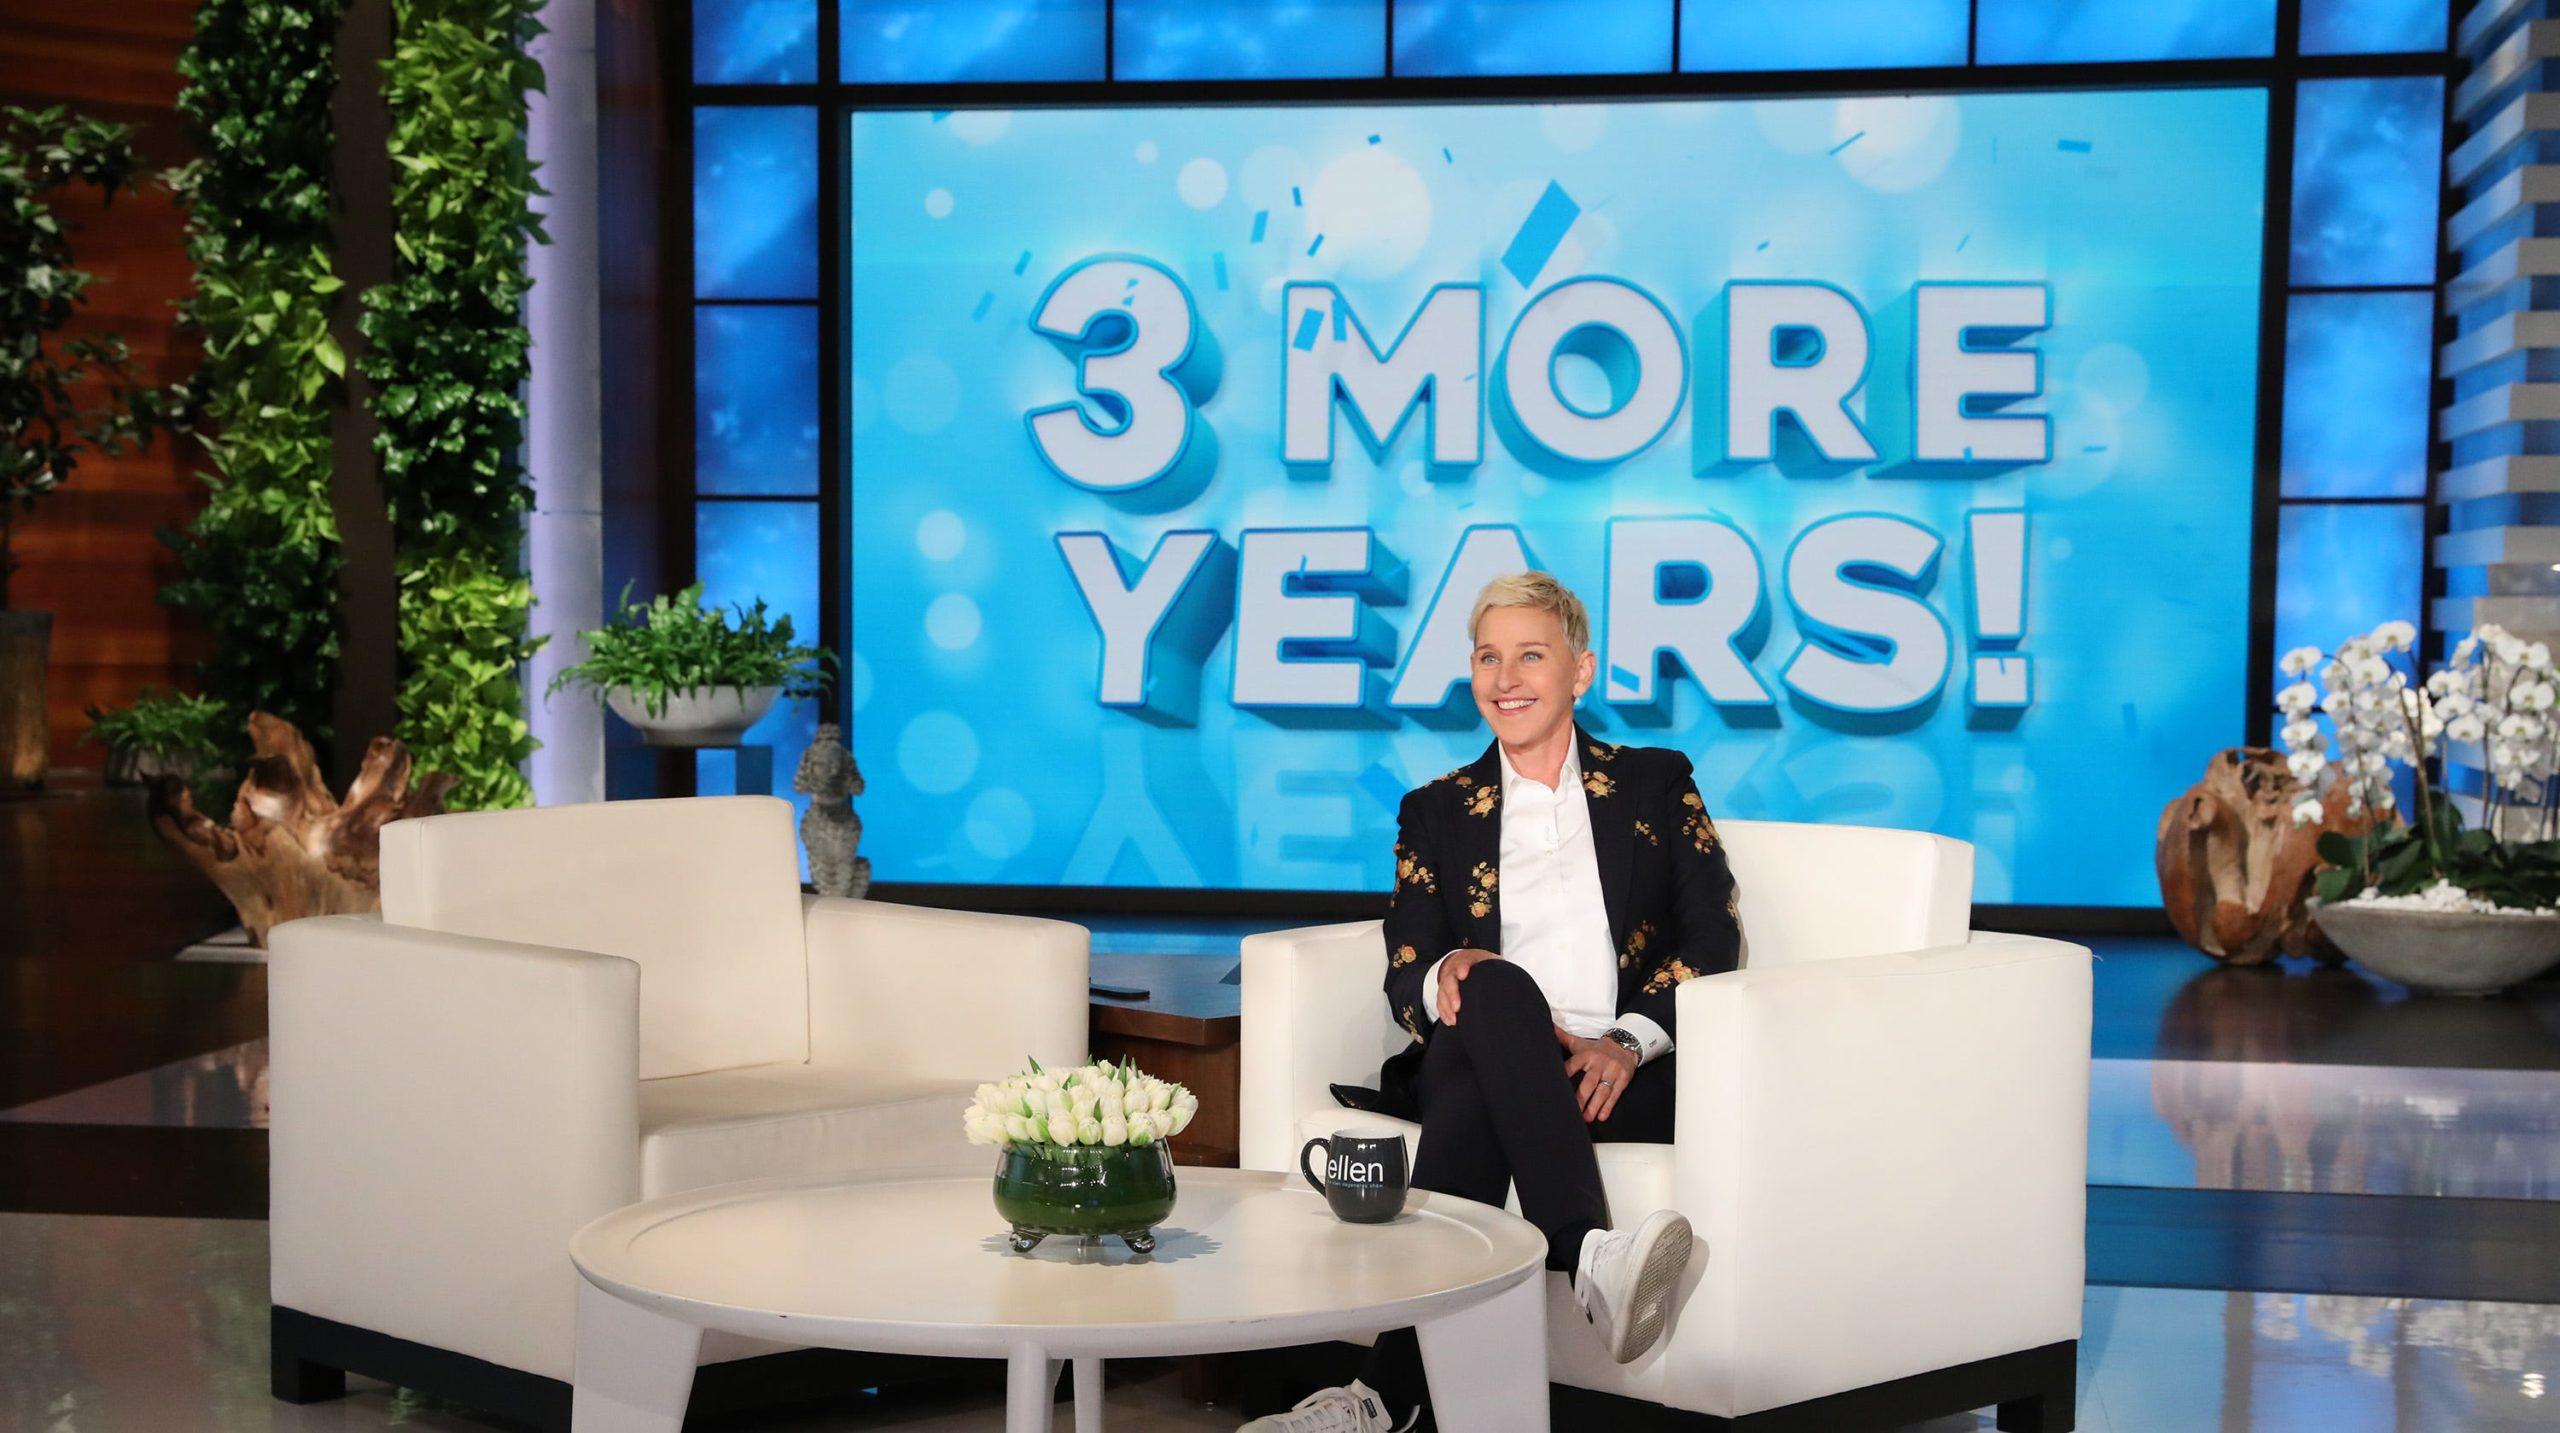 Ellen DeGeneres Final Season of Talk Show A Happy Place! The Ellen Show